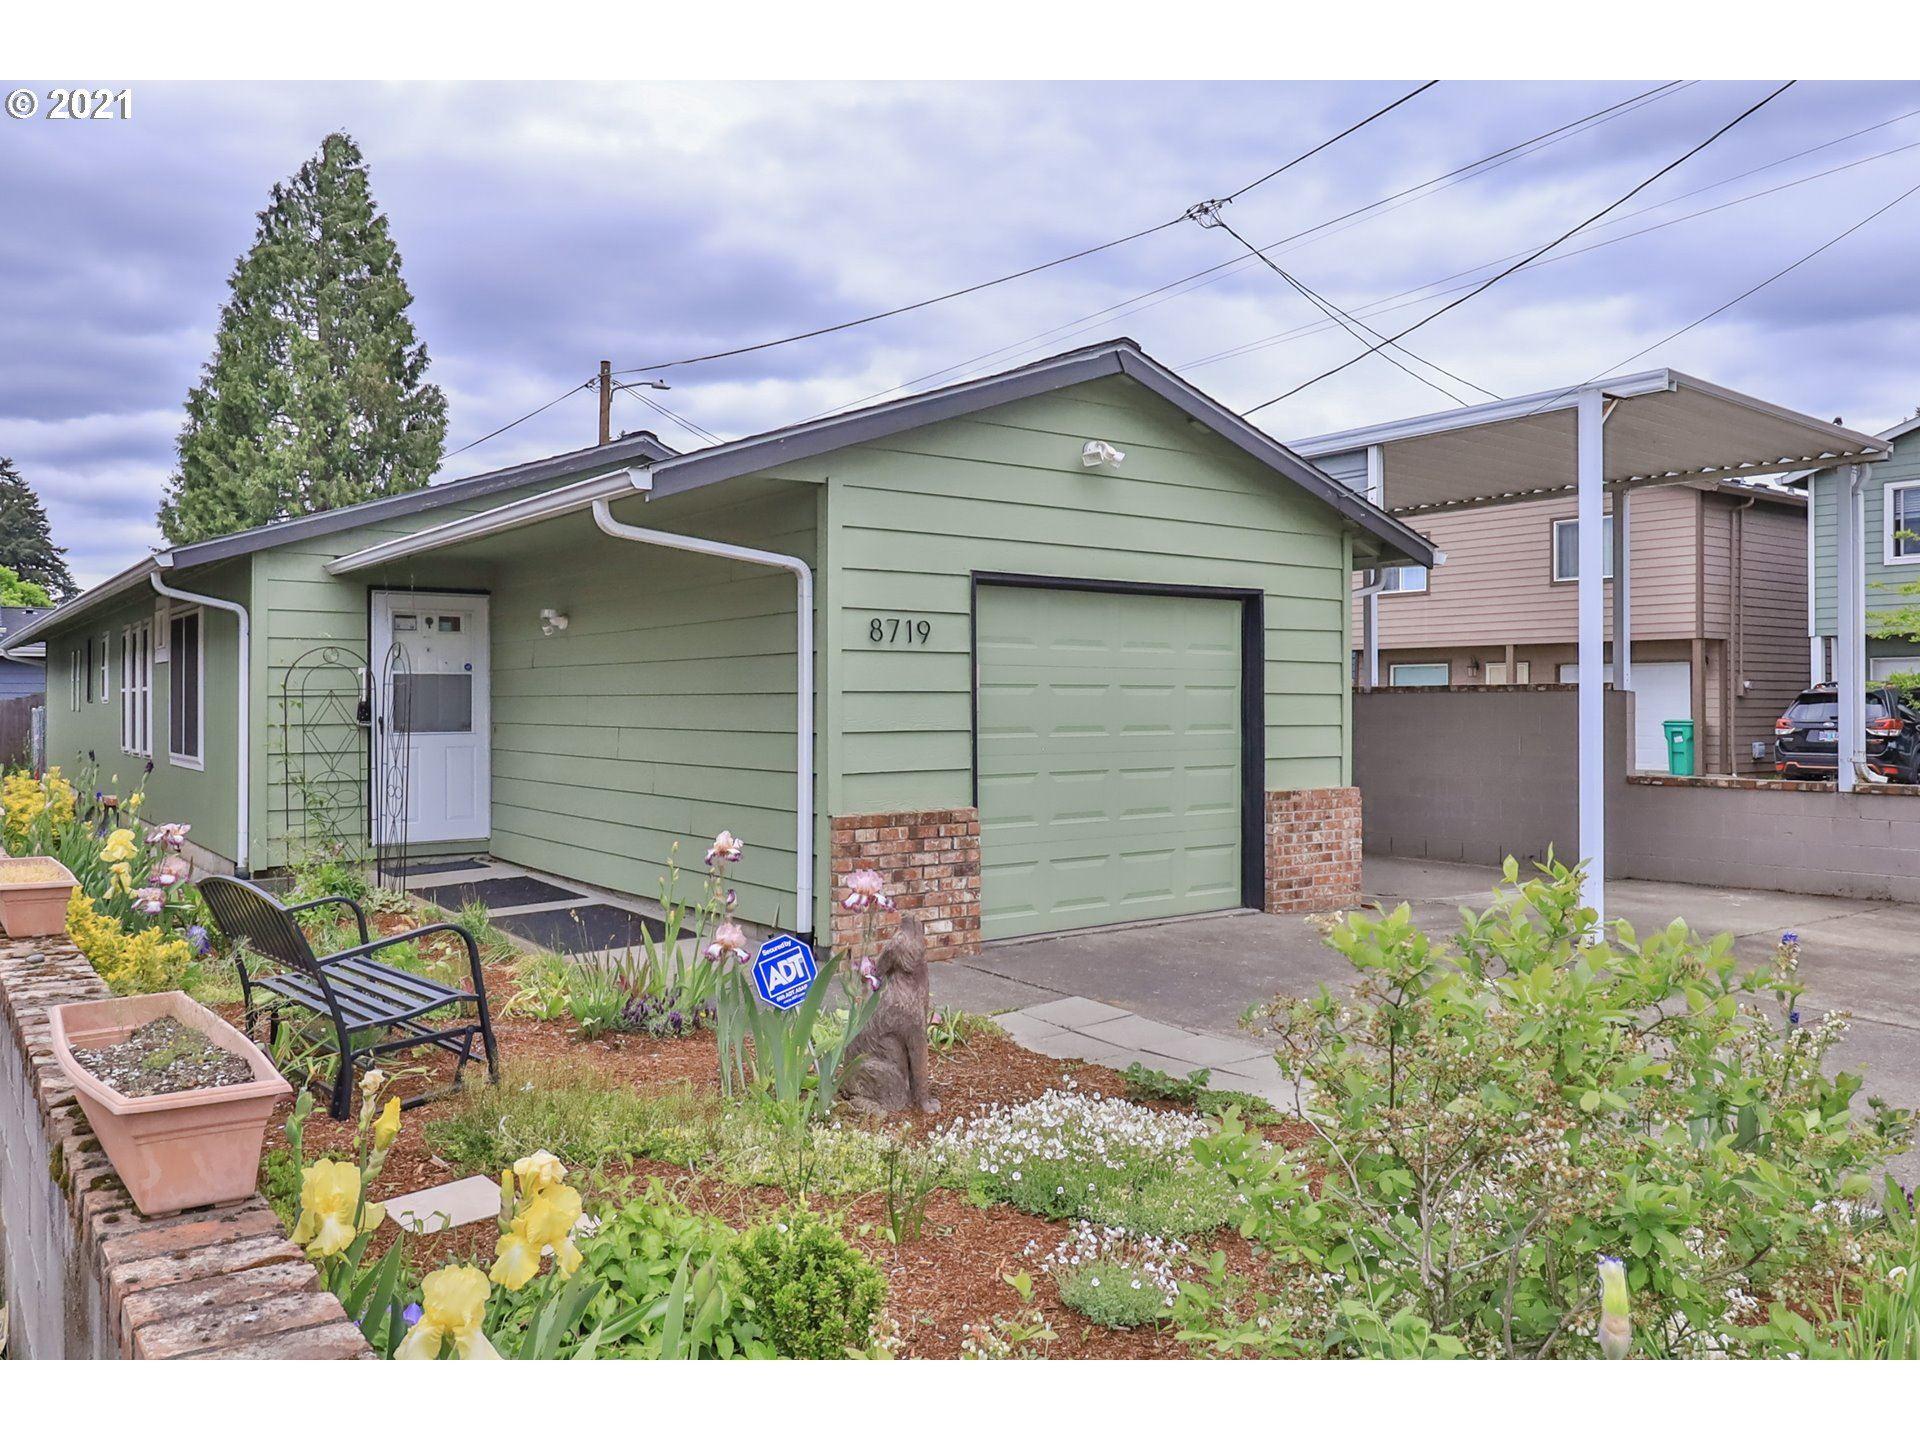 8719 SE ELLIS ST, Portland, OR 97266 - MLS#: 21606060